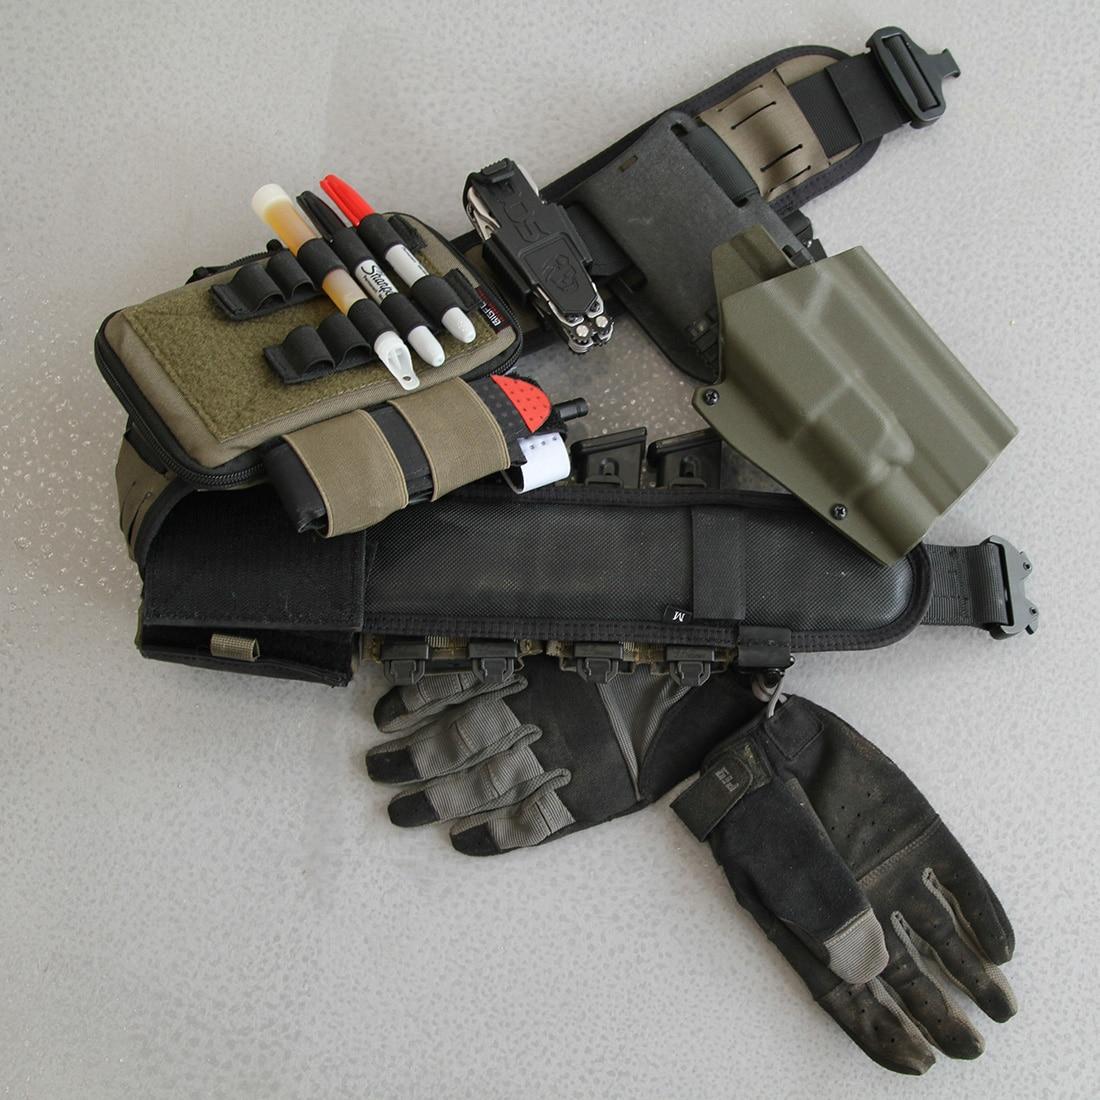 Closeout Deals×Waist-Support-Protector Waist-Belt Combat Practice-Rg Adjustable Outdoor Orion Airsoft